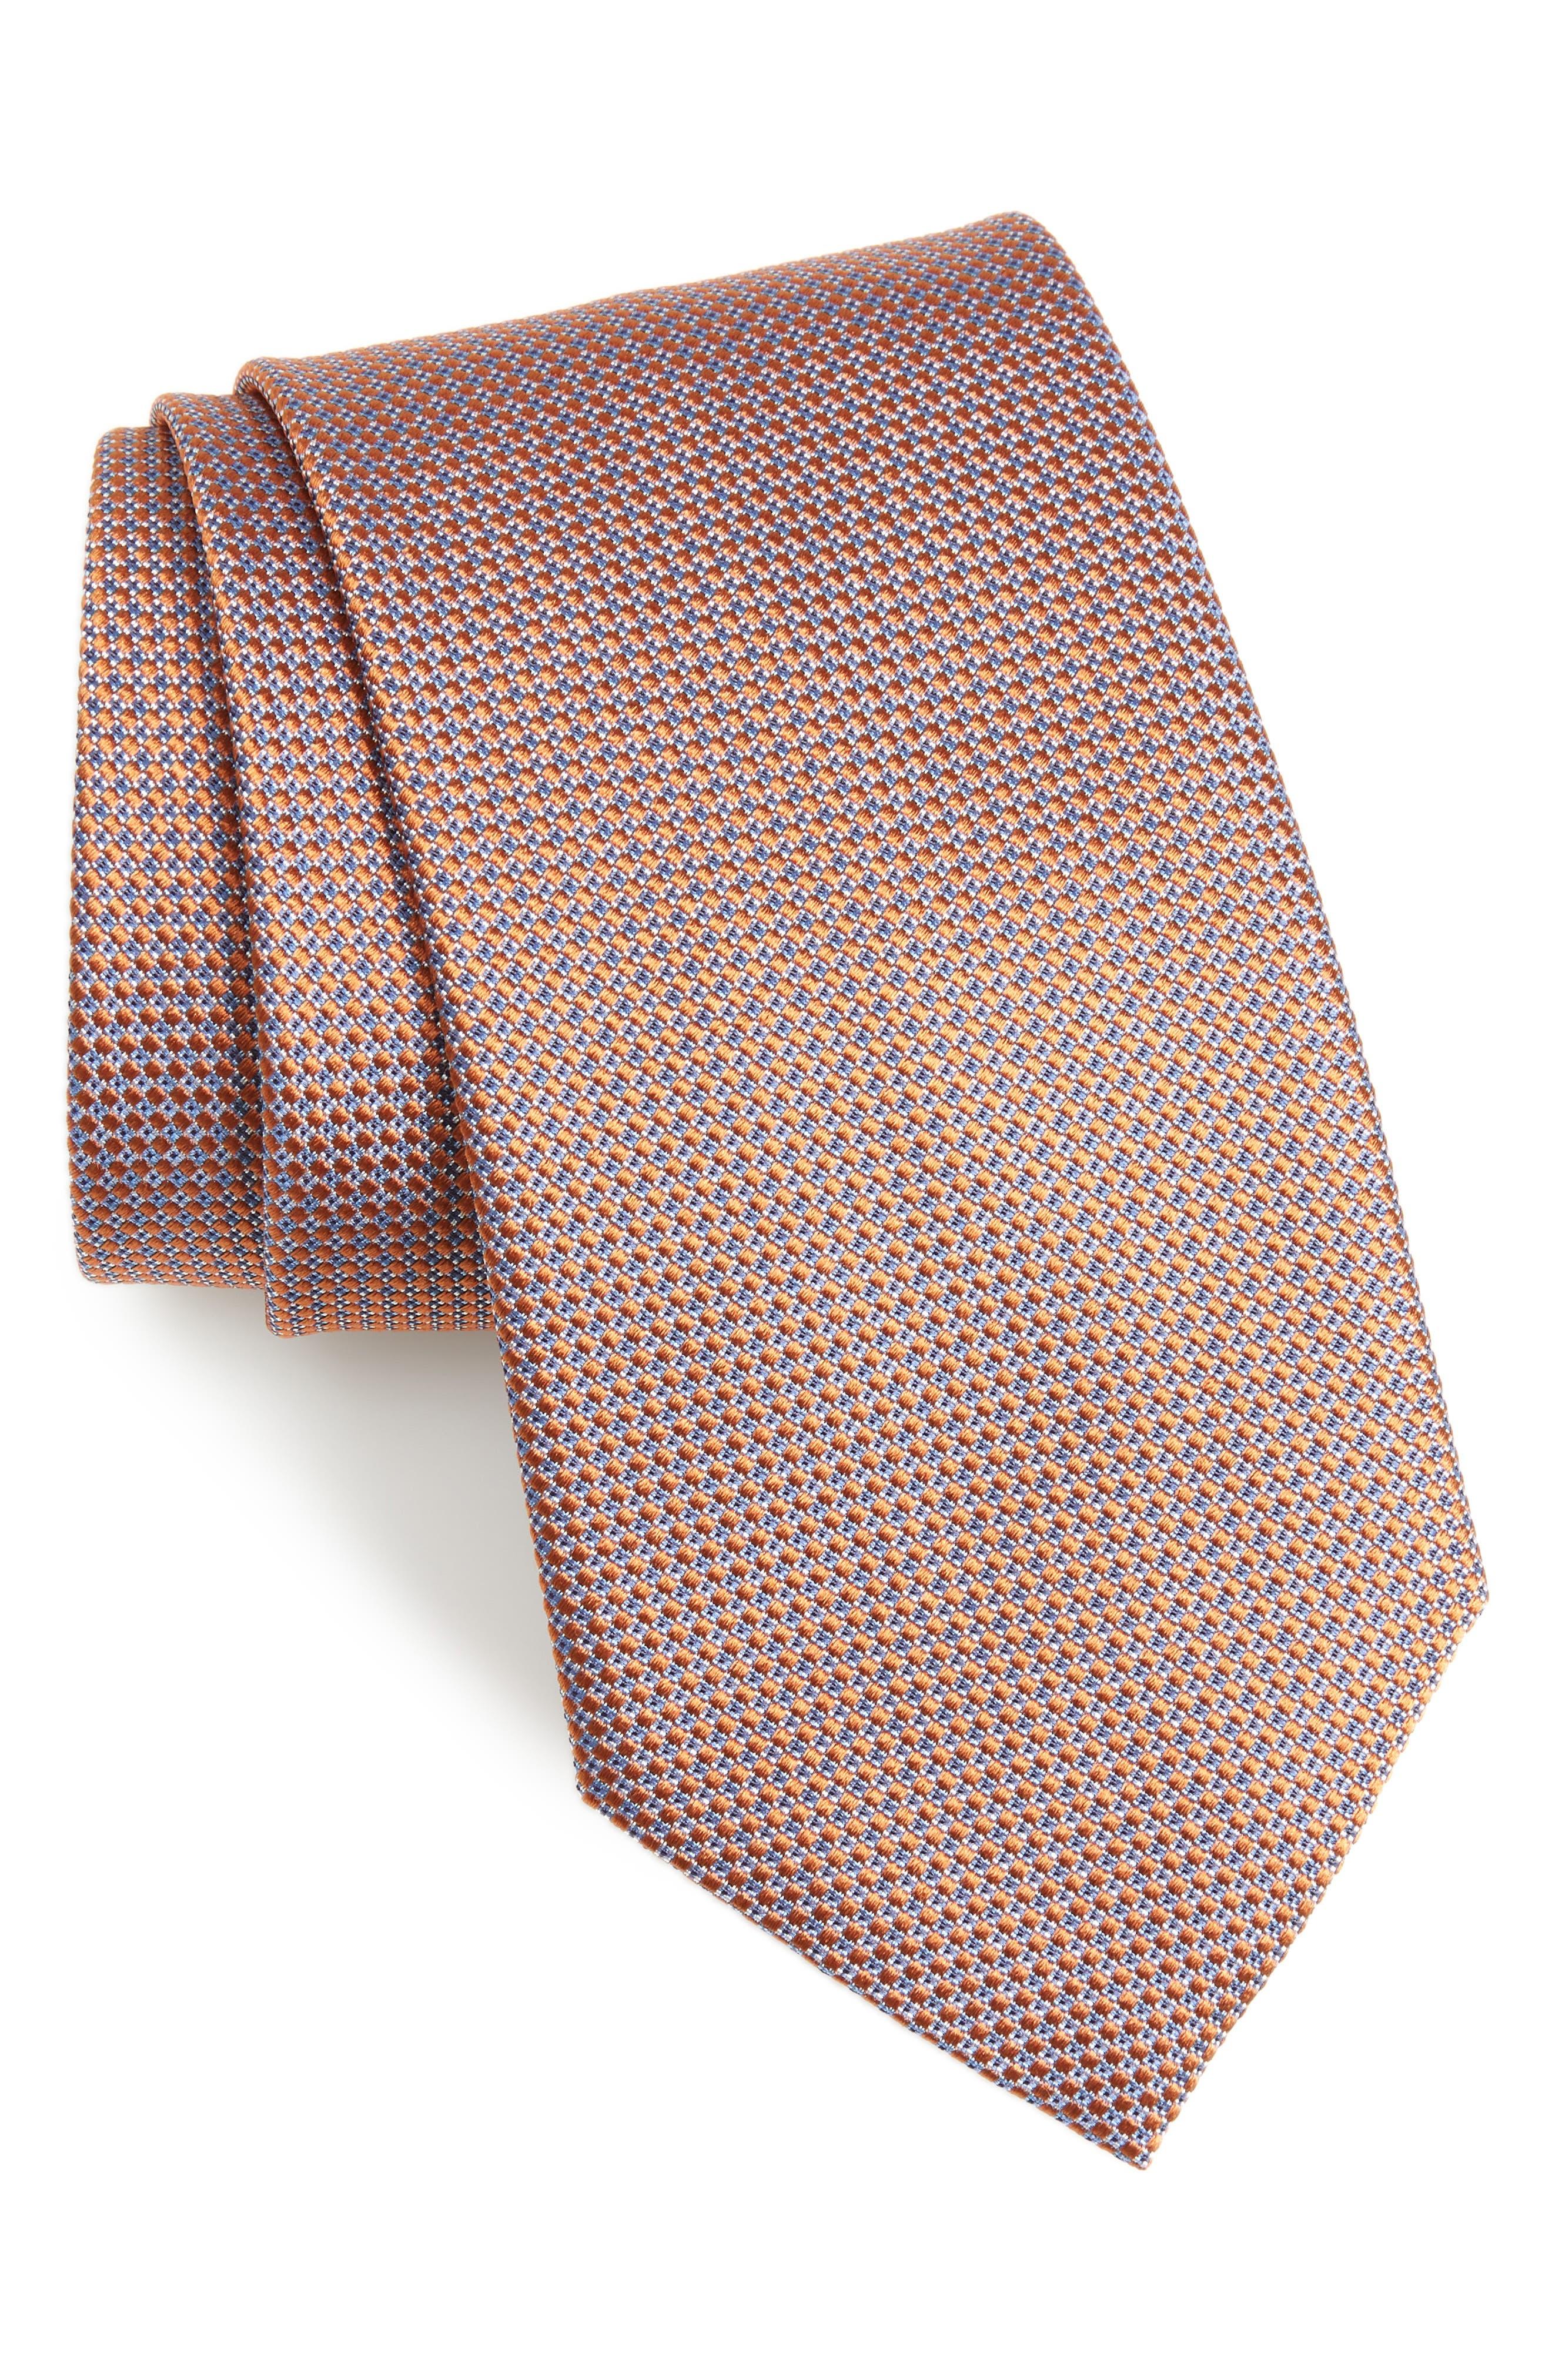 Neat Geometric Silk Tie,                             Main thumbnail 1, color,                             ORANGE/ BLUE